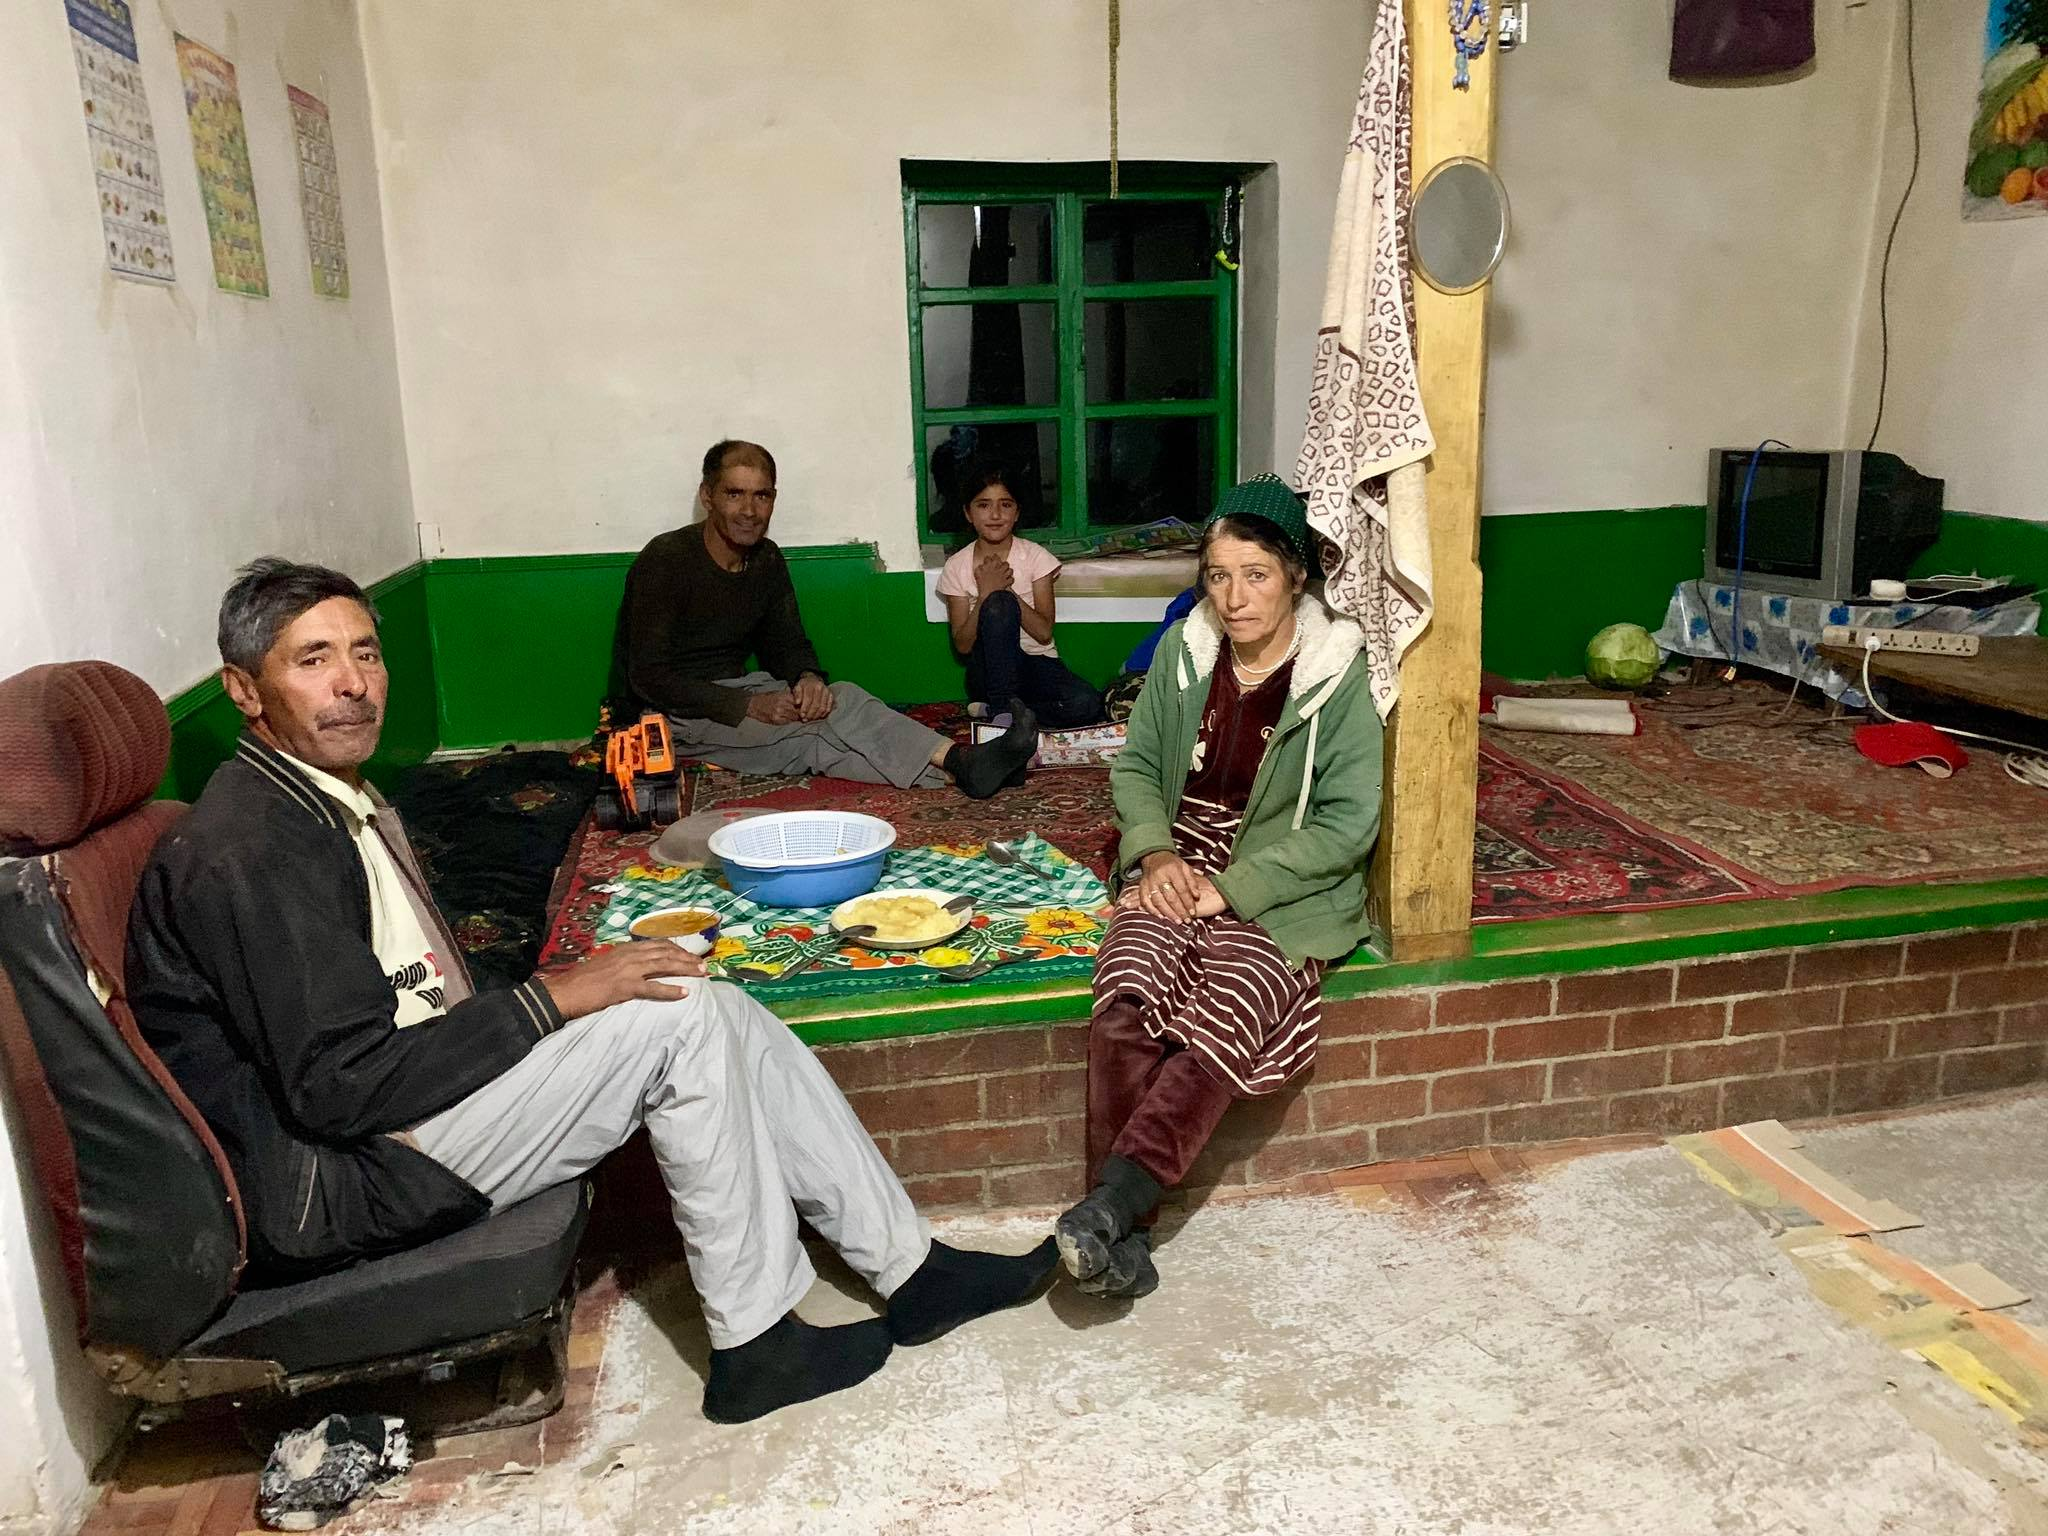 Kach Solo Travels in 2019 Experiencing a Traditional Wakhan Wedding in Tajikistan16.jpg